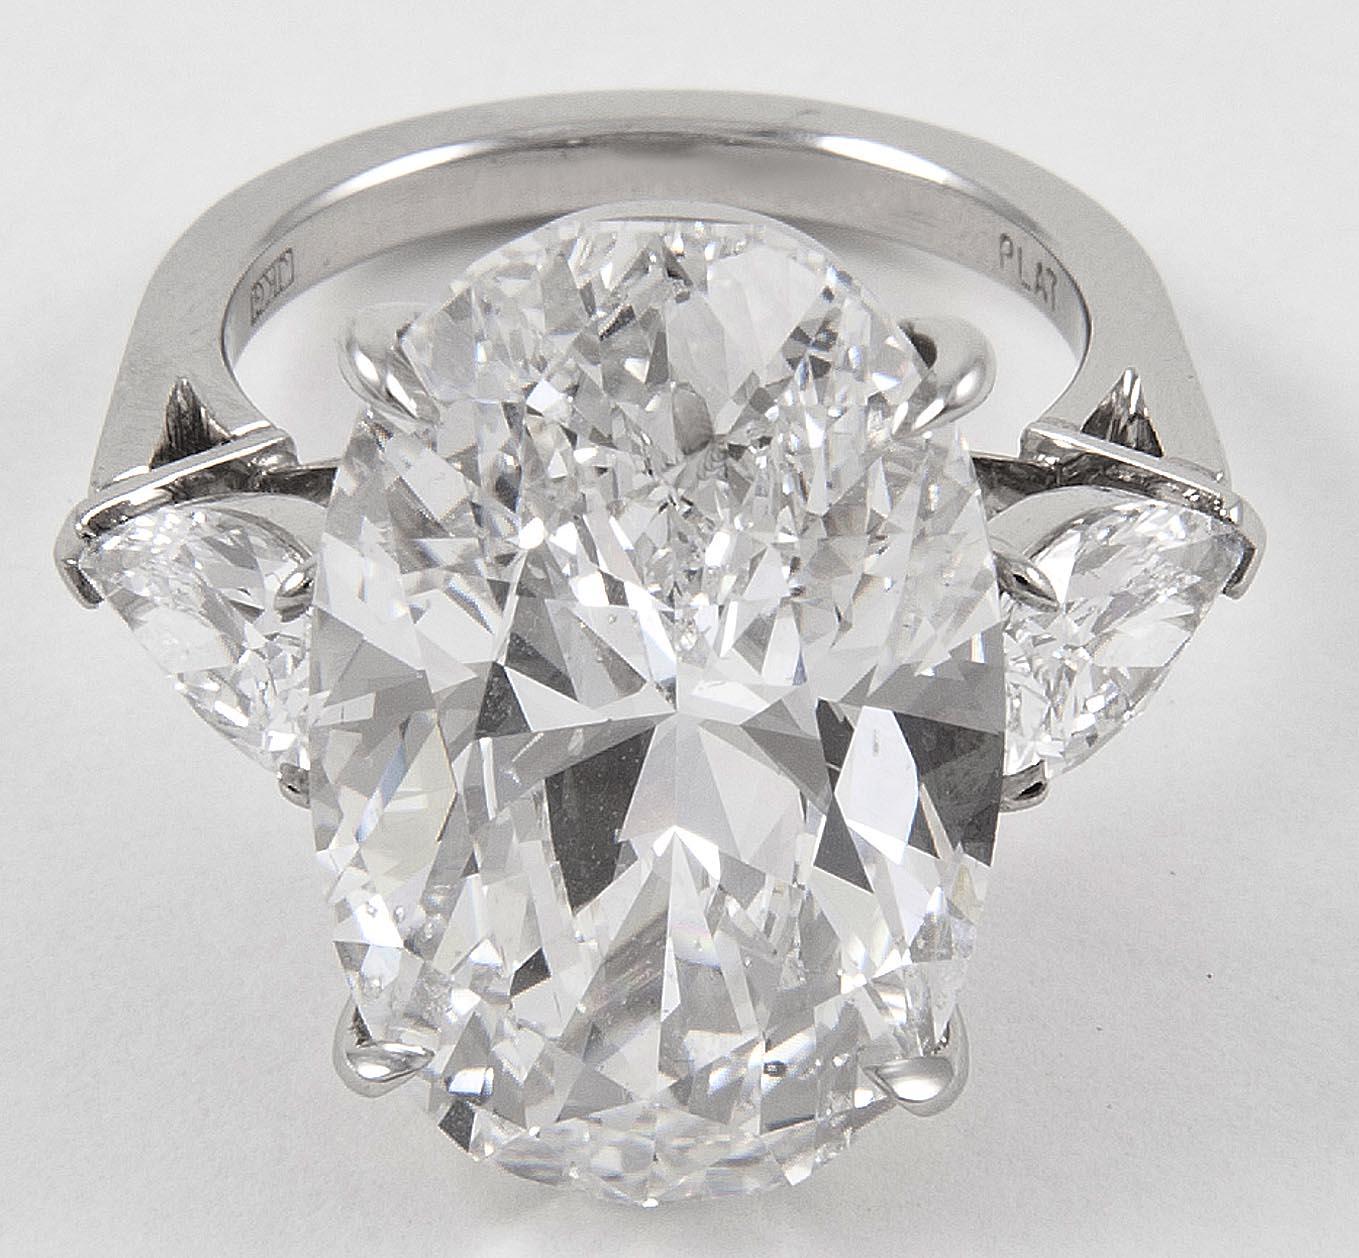 http://2.bp.blogspot.com/-a-csI5x7k8s/UFqsQzNKdCI/AAAAAAACiAY/YdkMFa1DL5Q/s1600/Forevermark+diamonds+ryan+reynolds.jpg